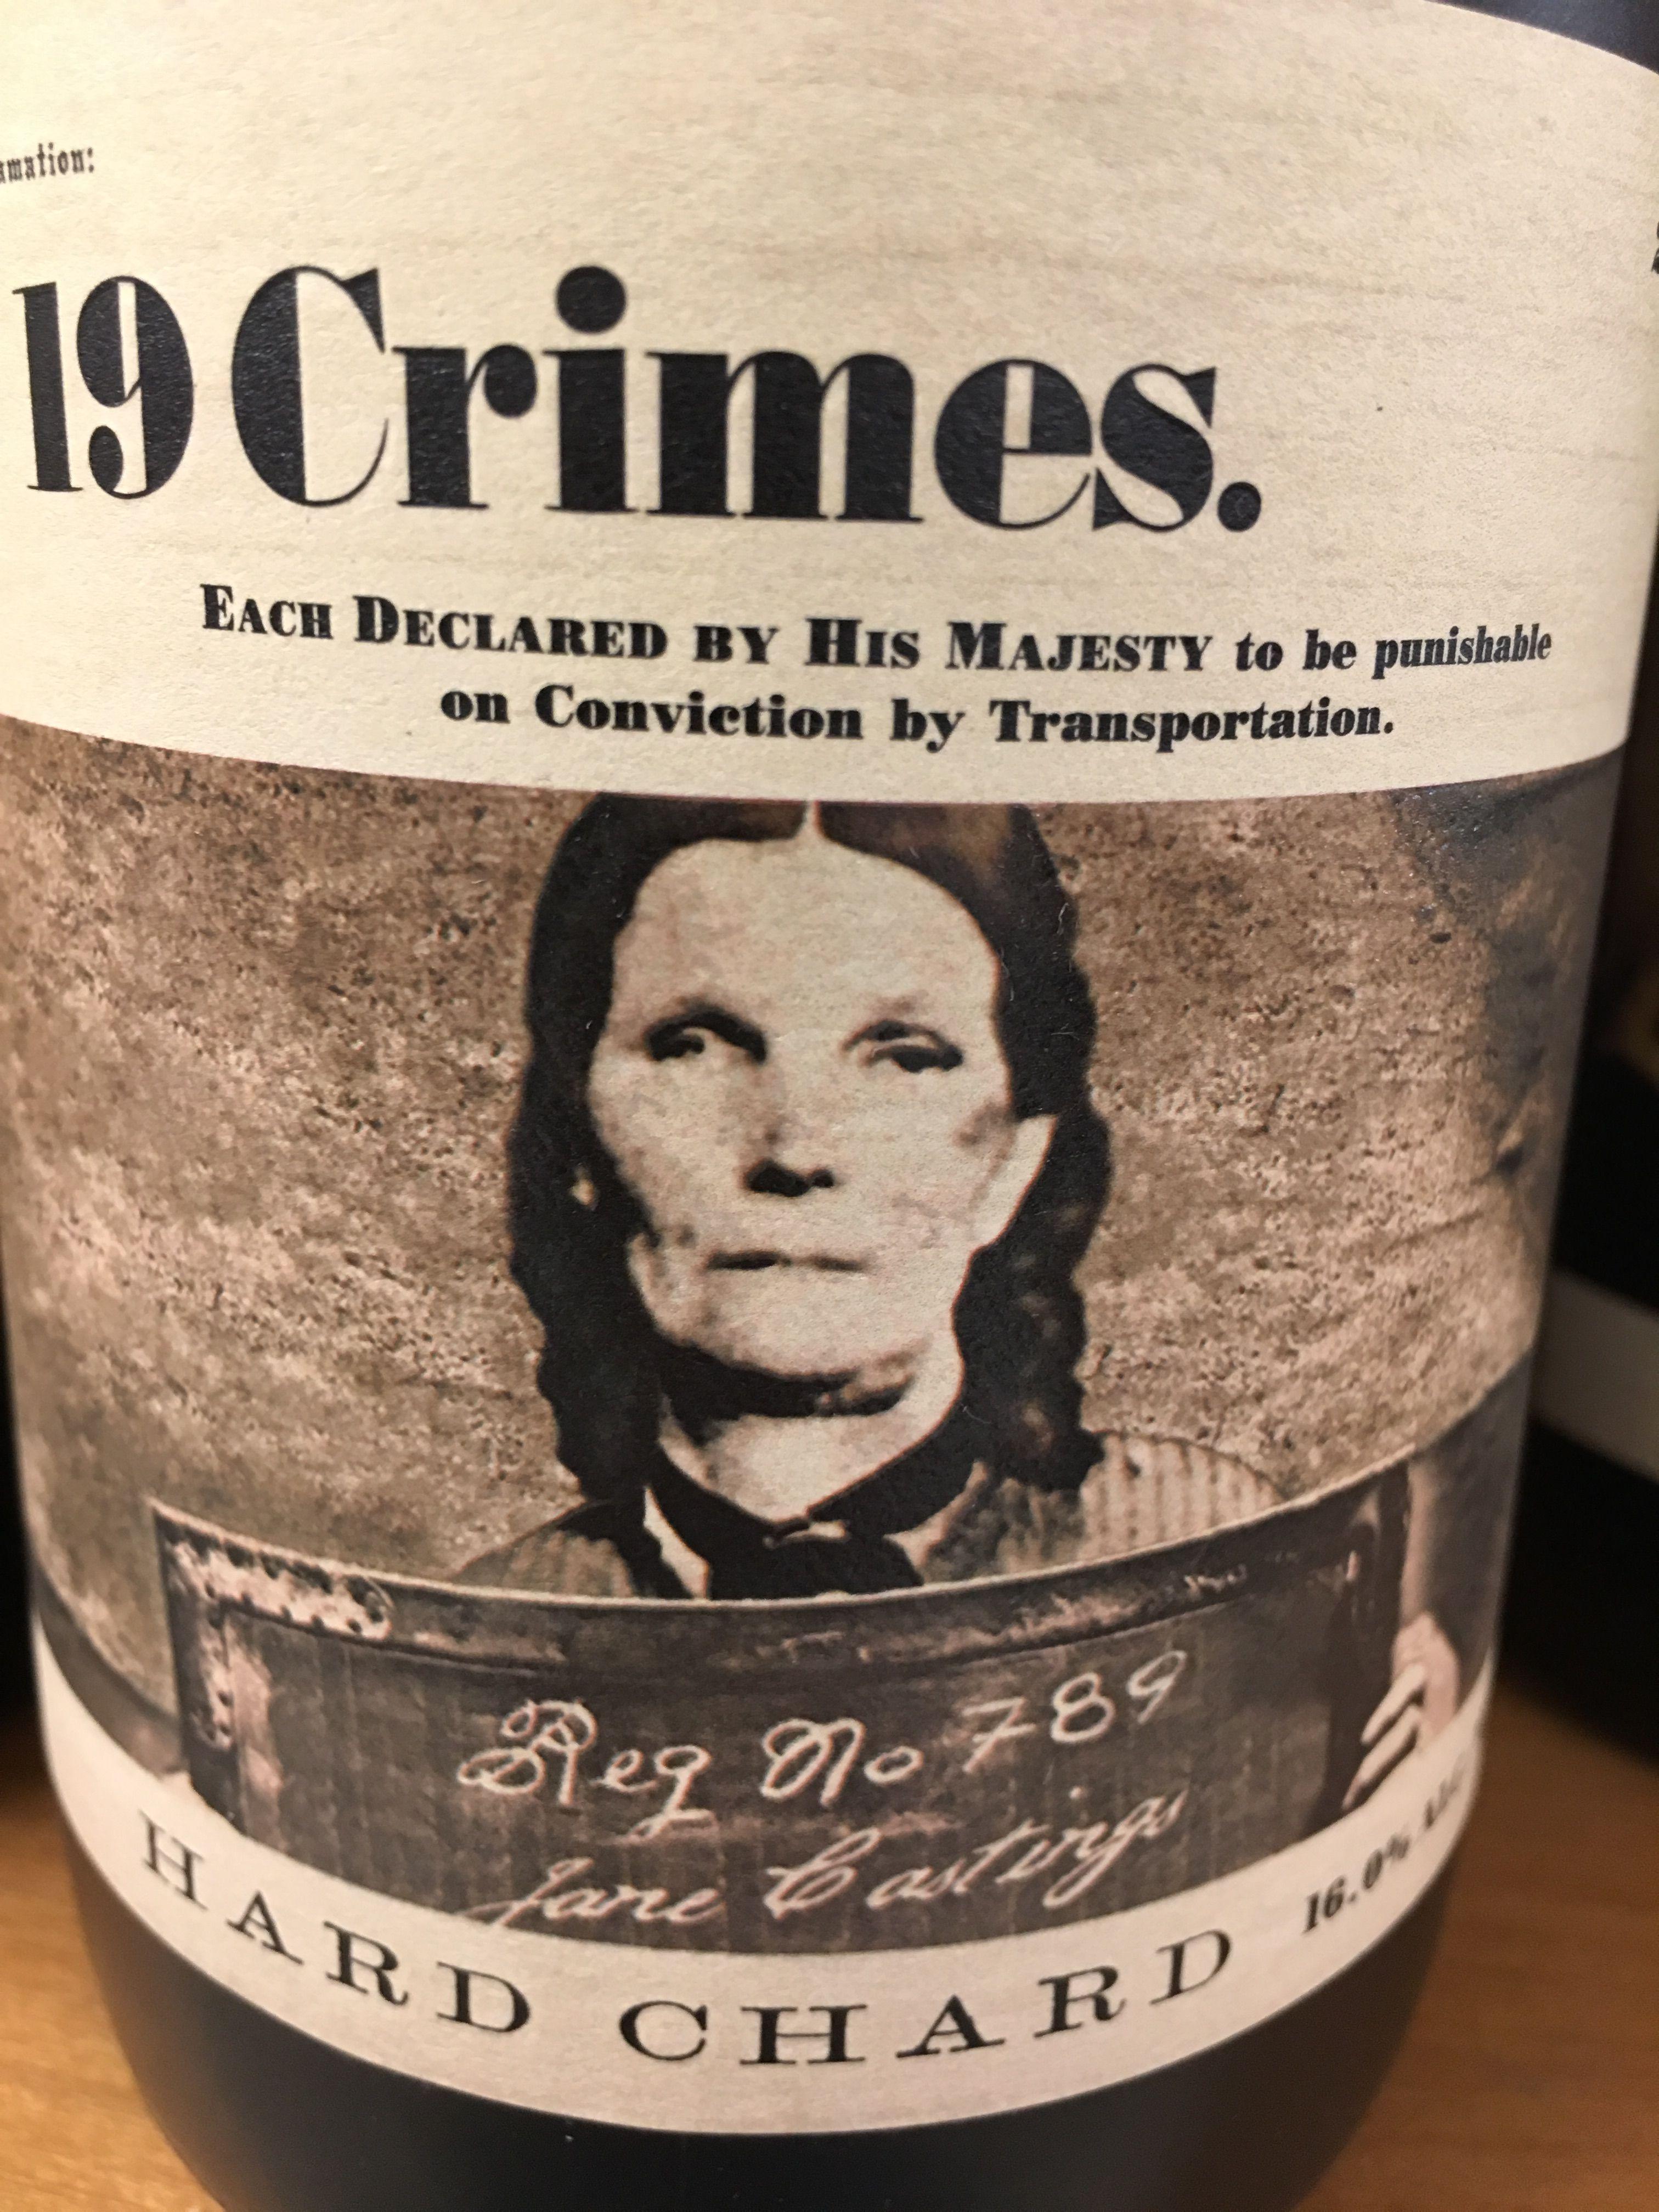 19 Crimes wine 19 crimes wine, Wine variety, Wine